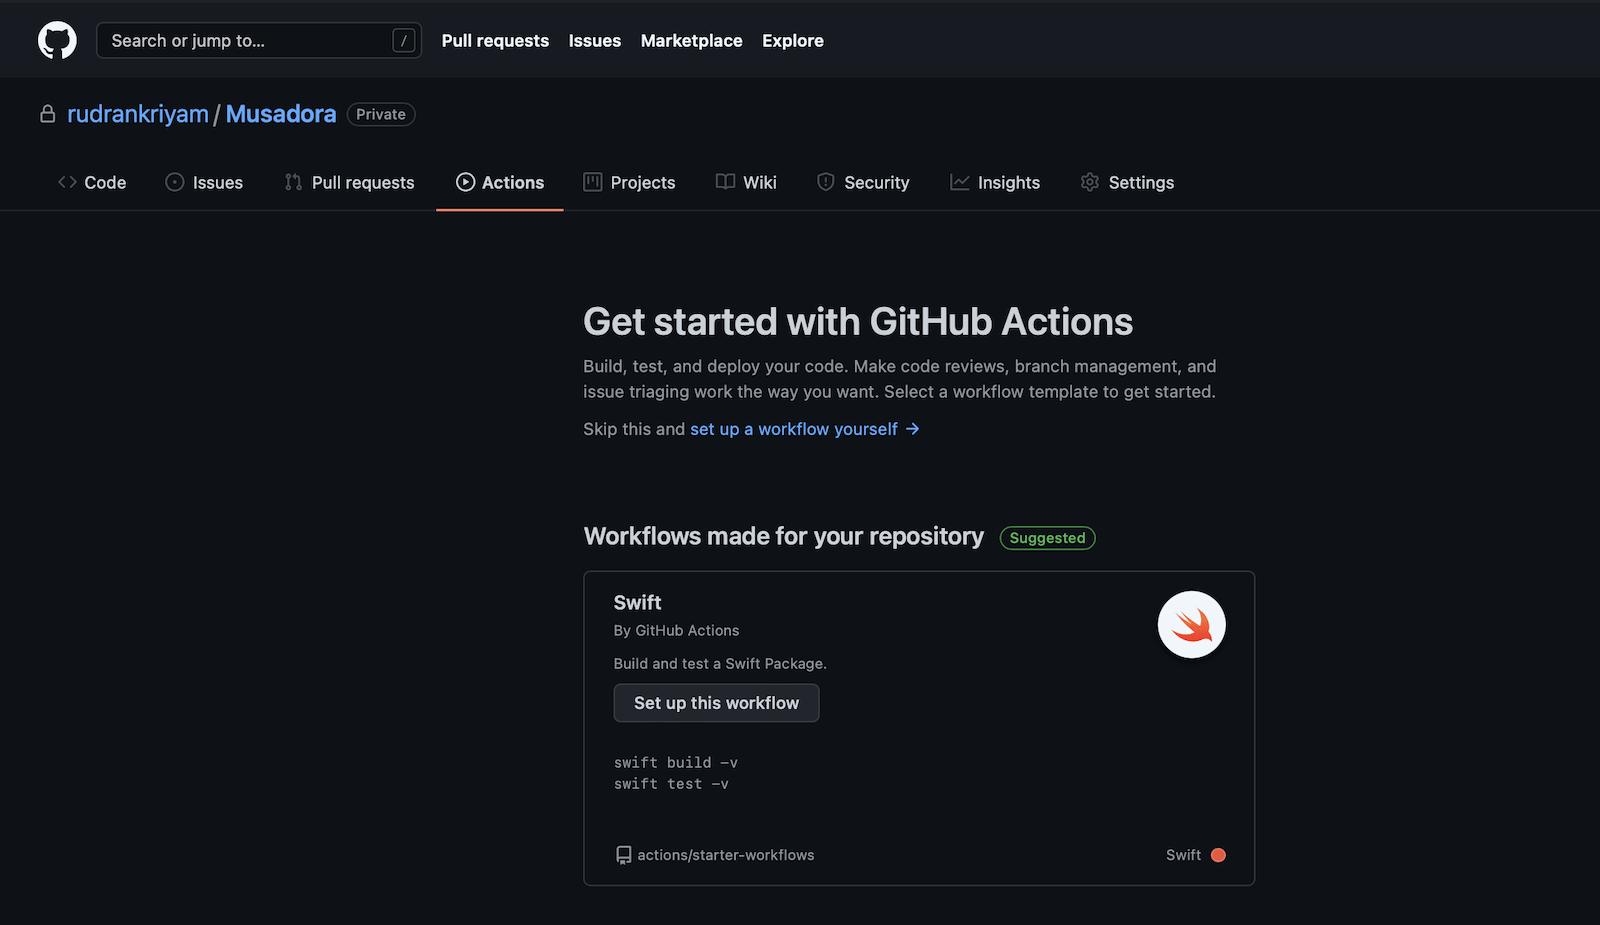 GitHub Actions onboarding: Onboarding screen